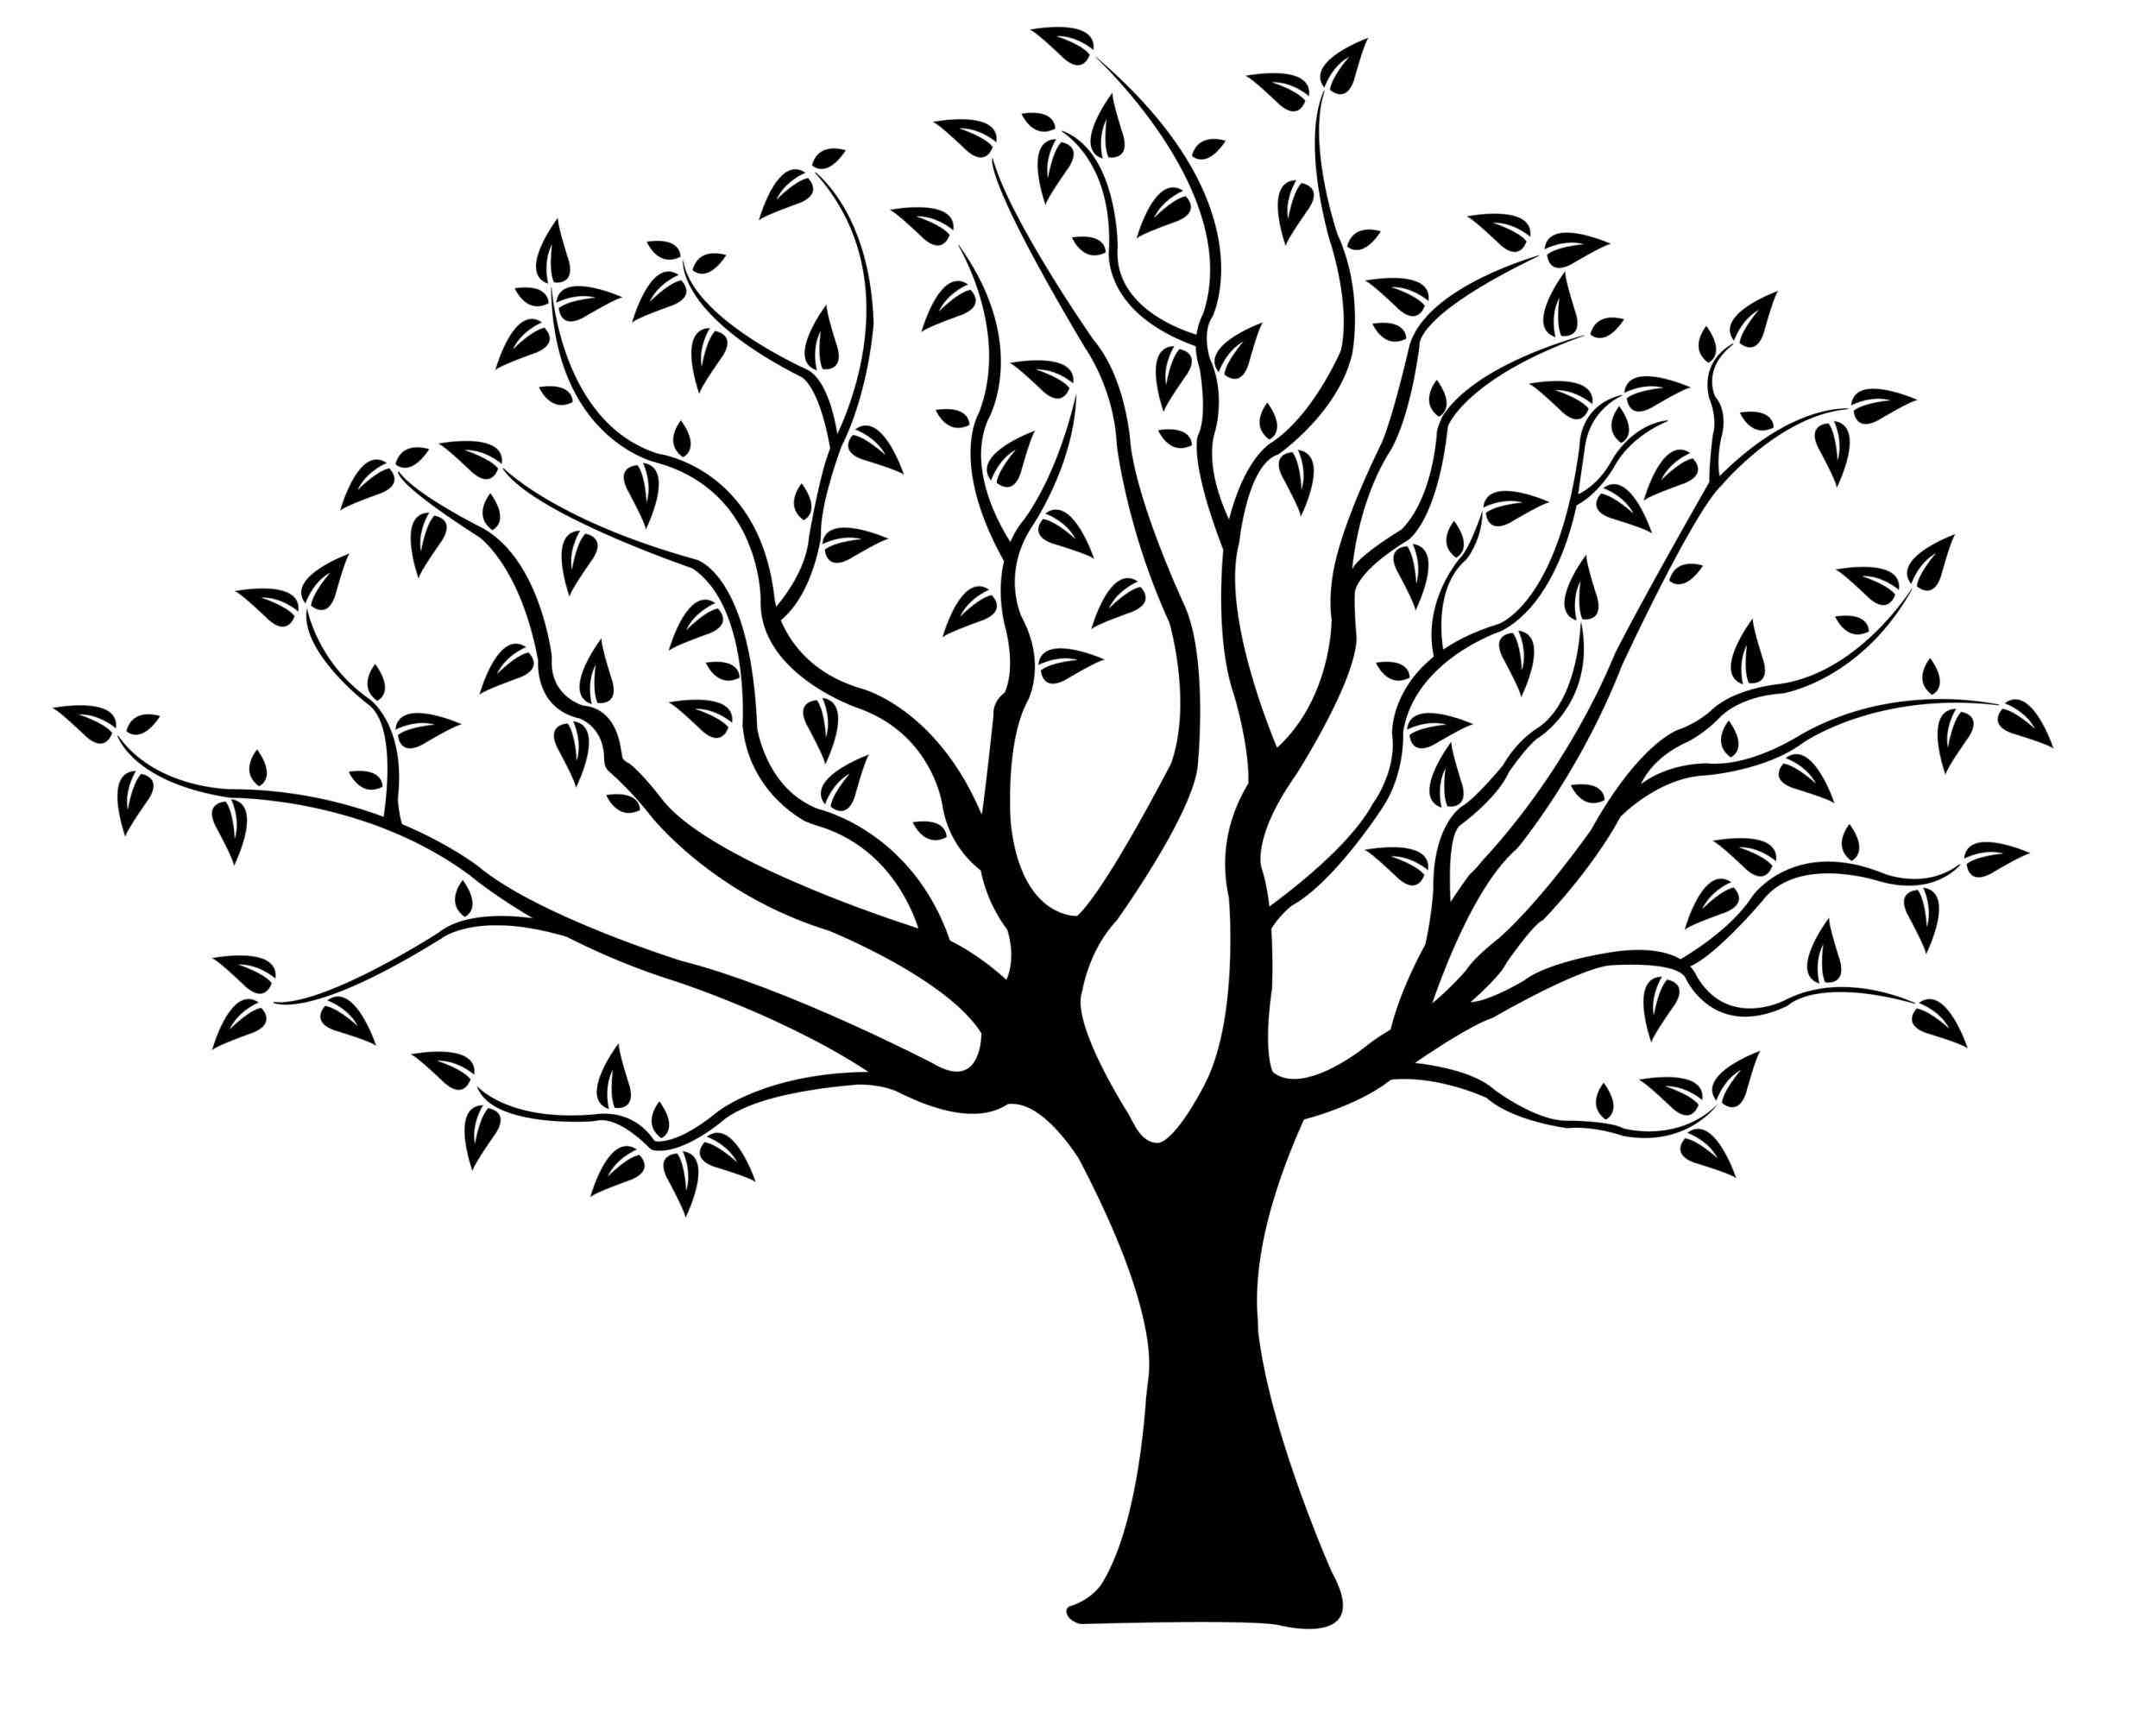 Simple Tree Line Drawing at GetDrawings.com.